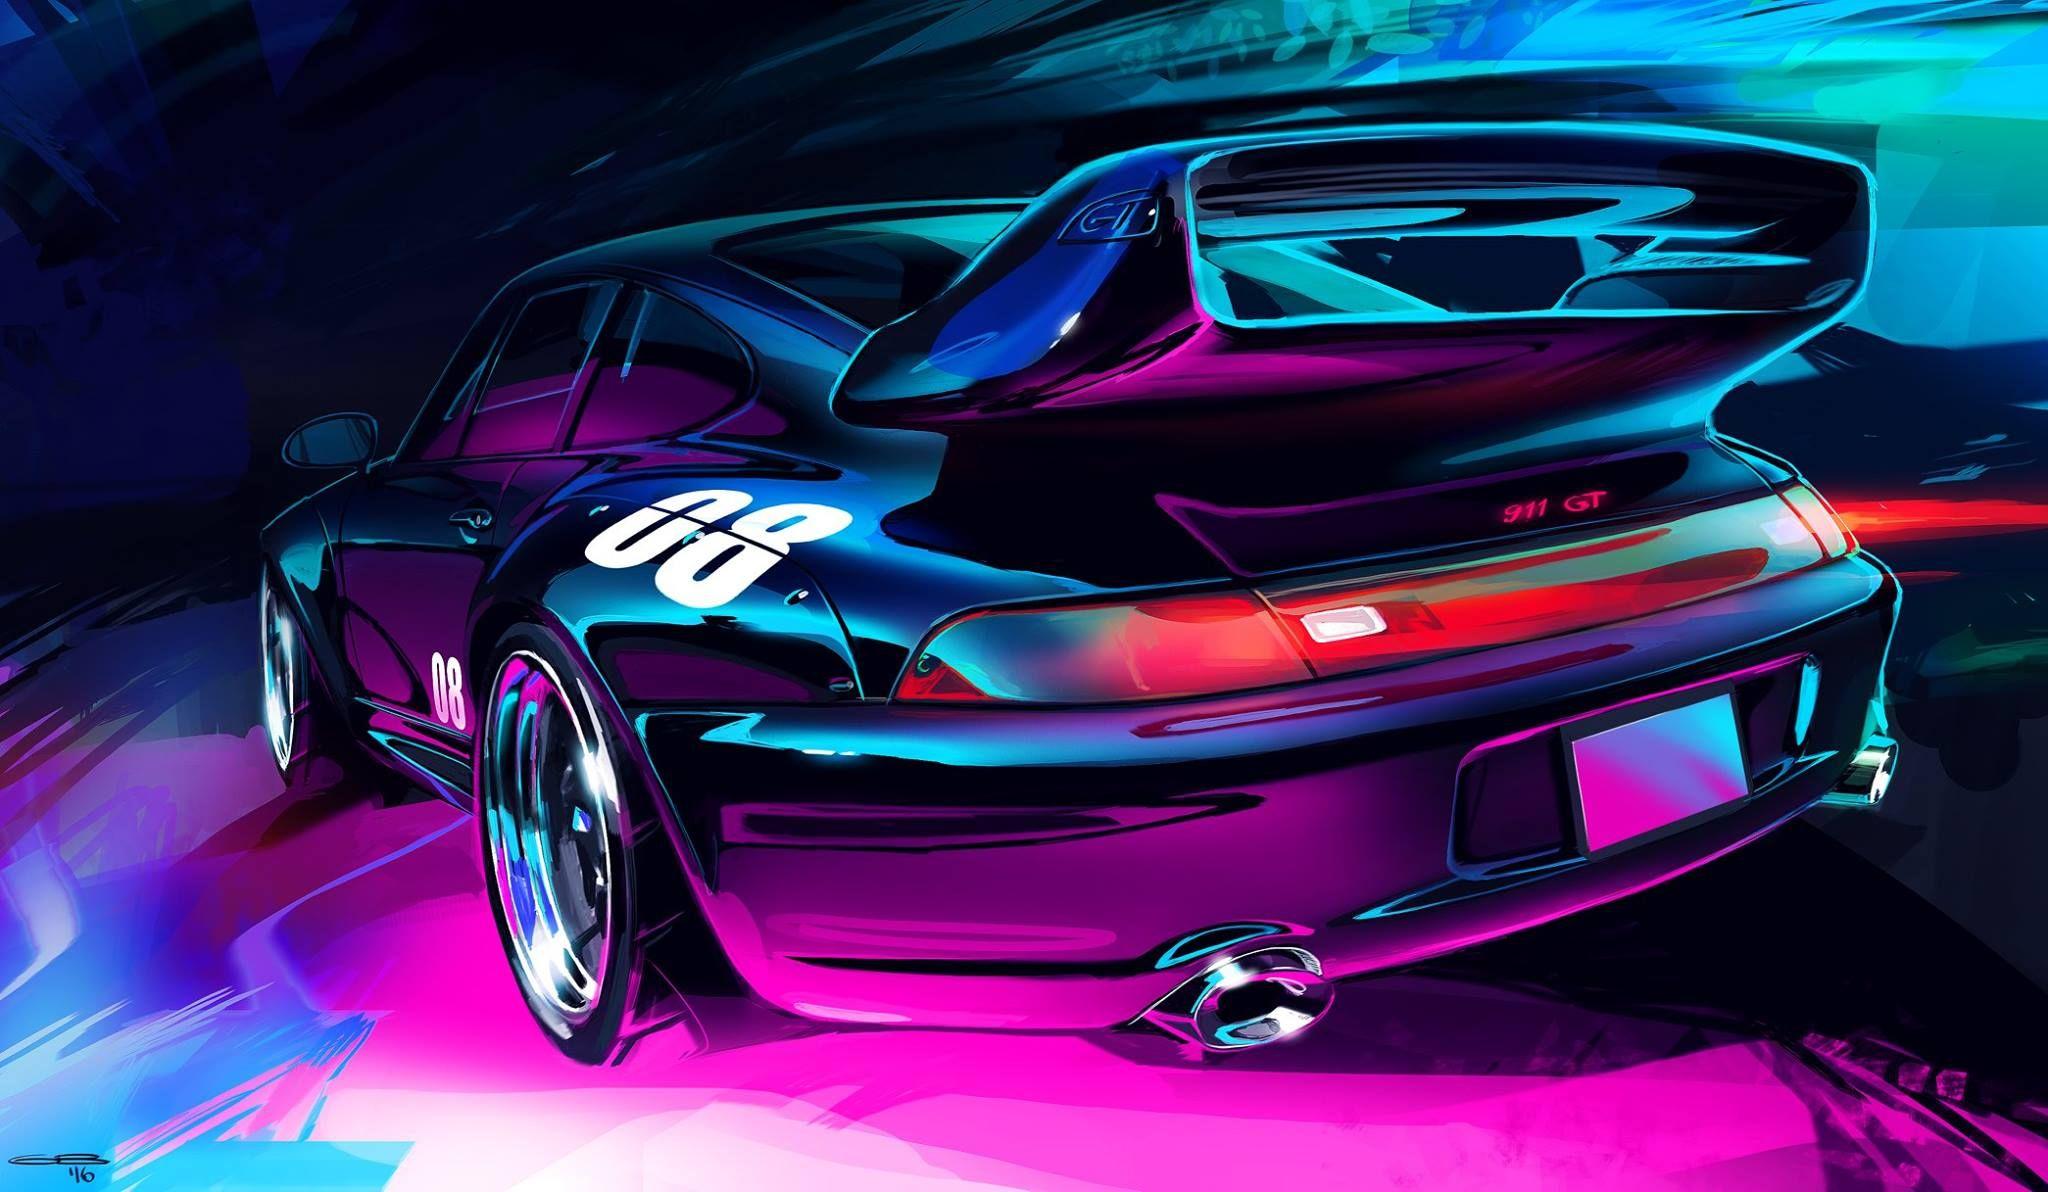 Art Cars Car Artwork Automotive Illustration